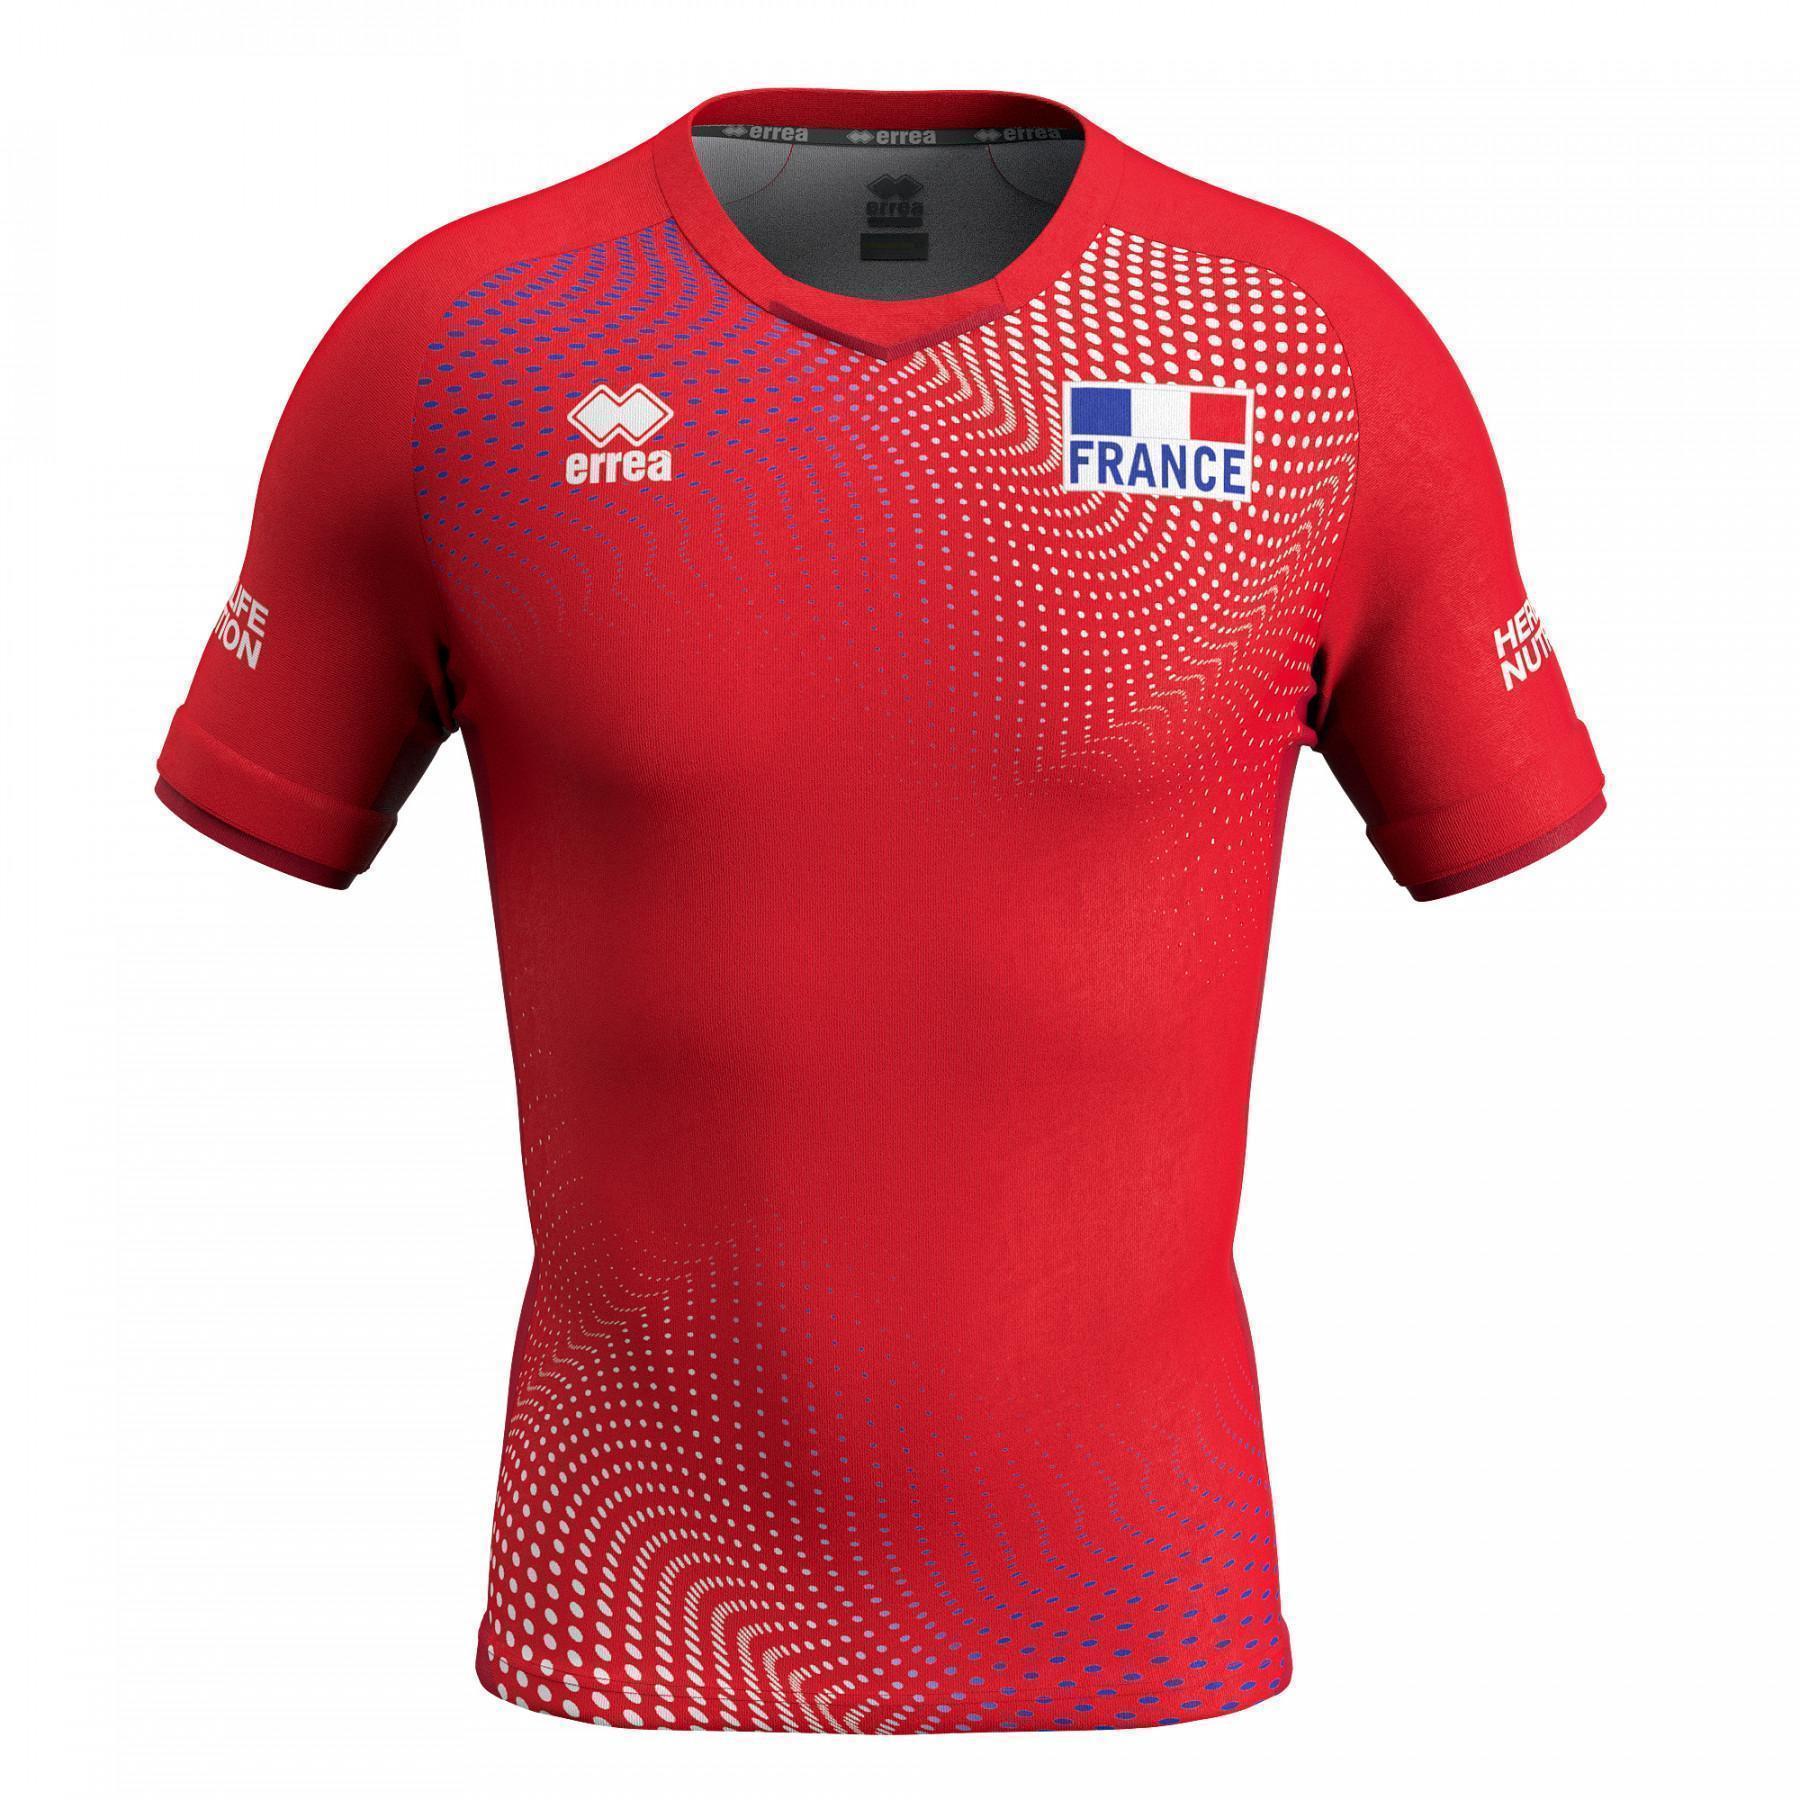 Camiseta del tercer equipo de Francia de voleibol 2020